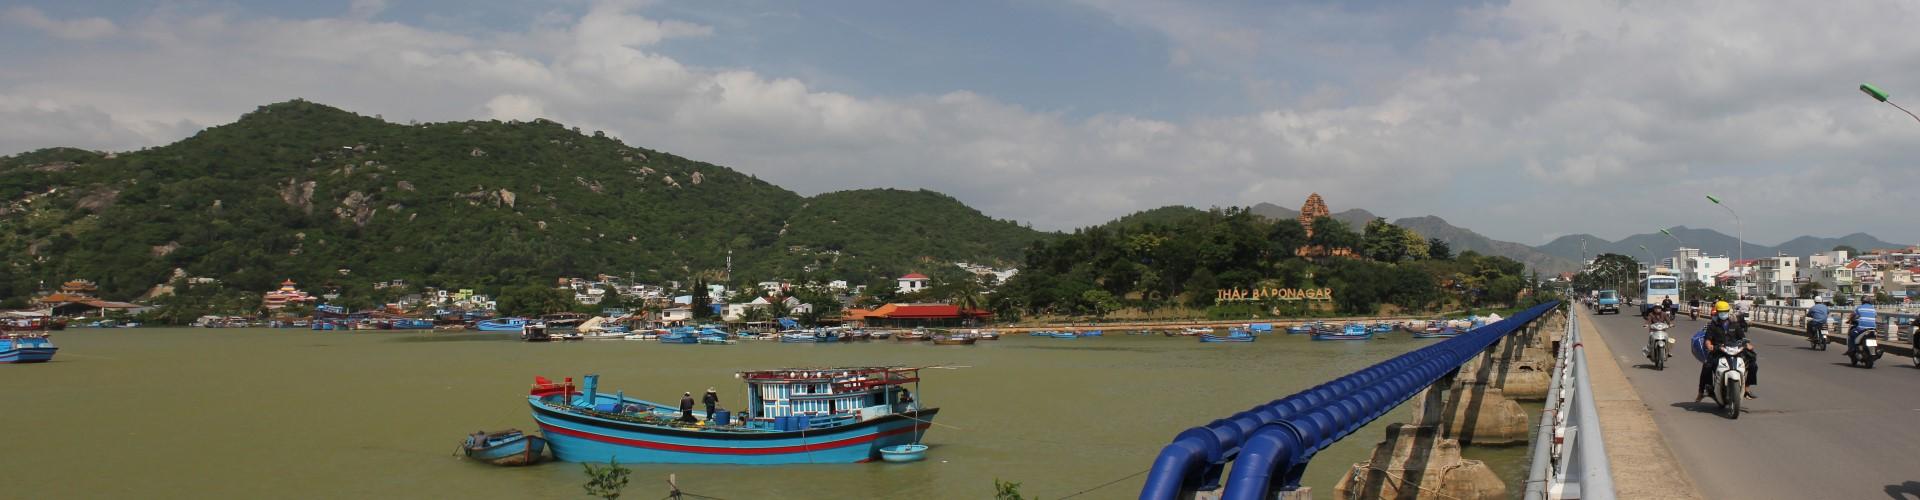 Blick auf den Fluss Sông Cái Nha Trang